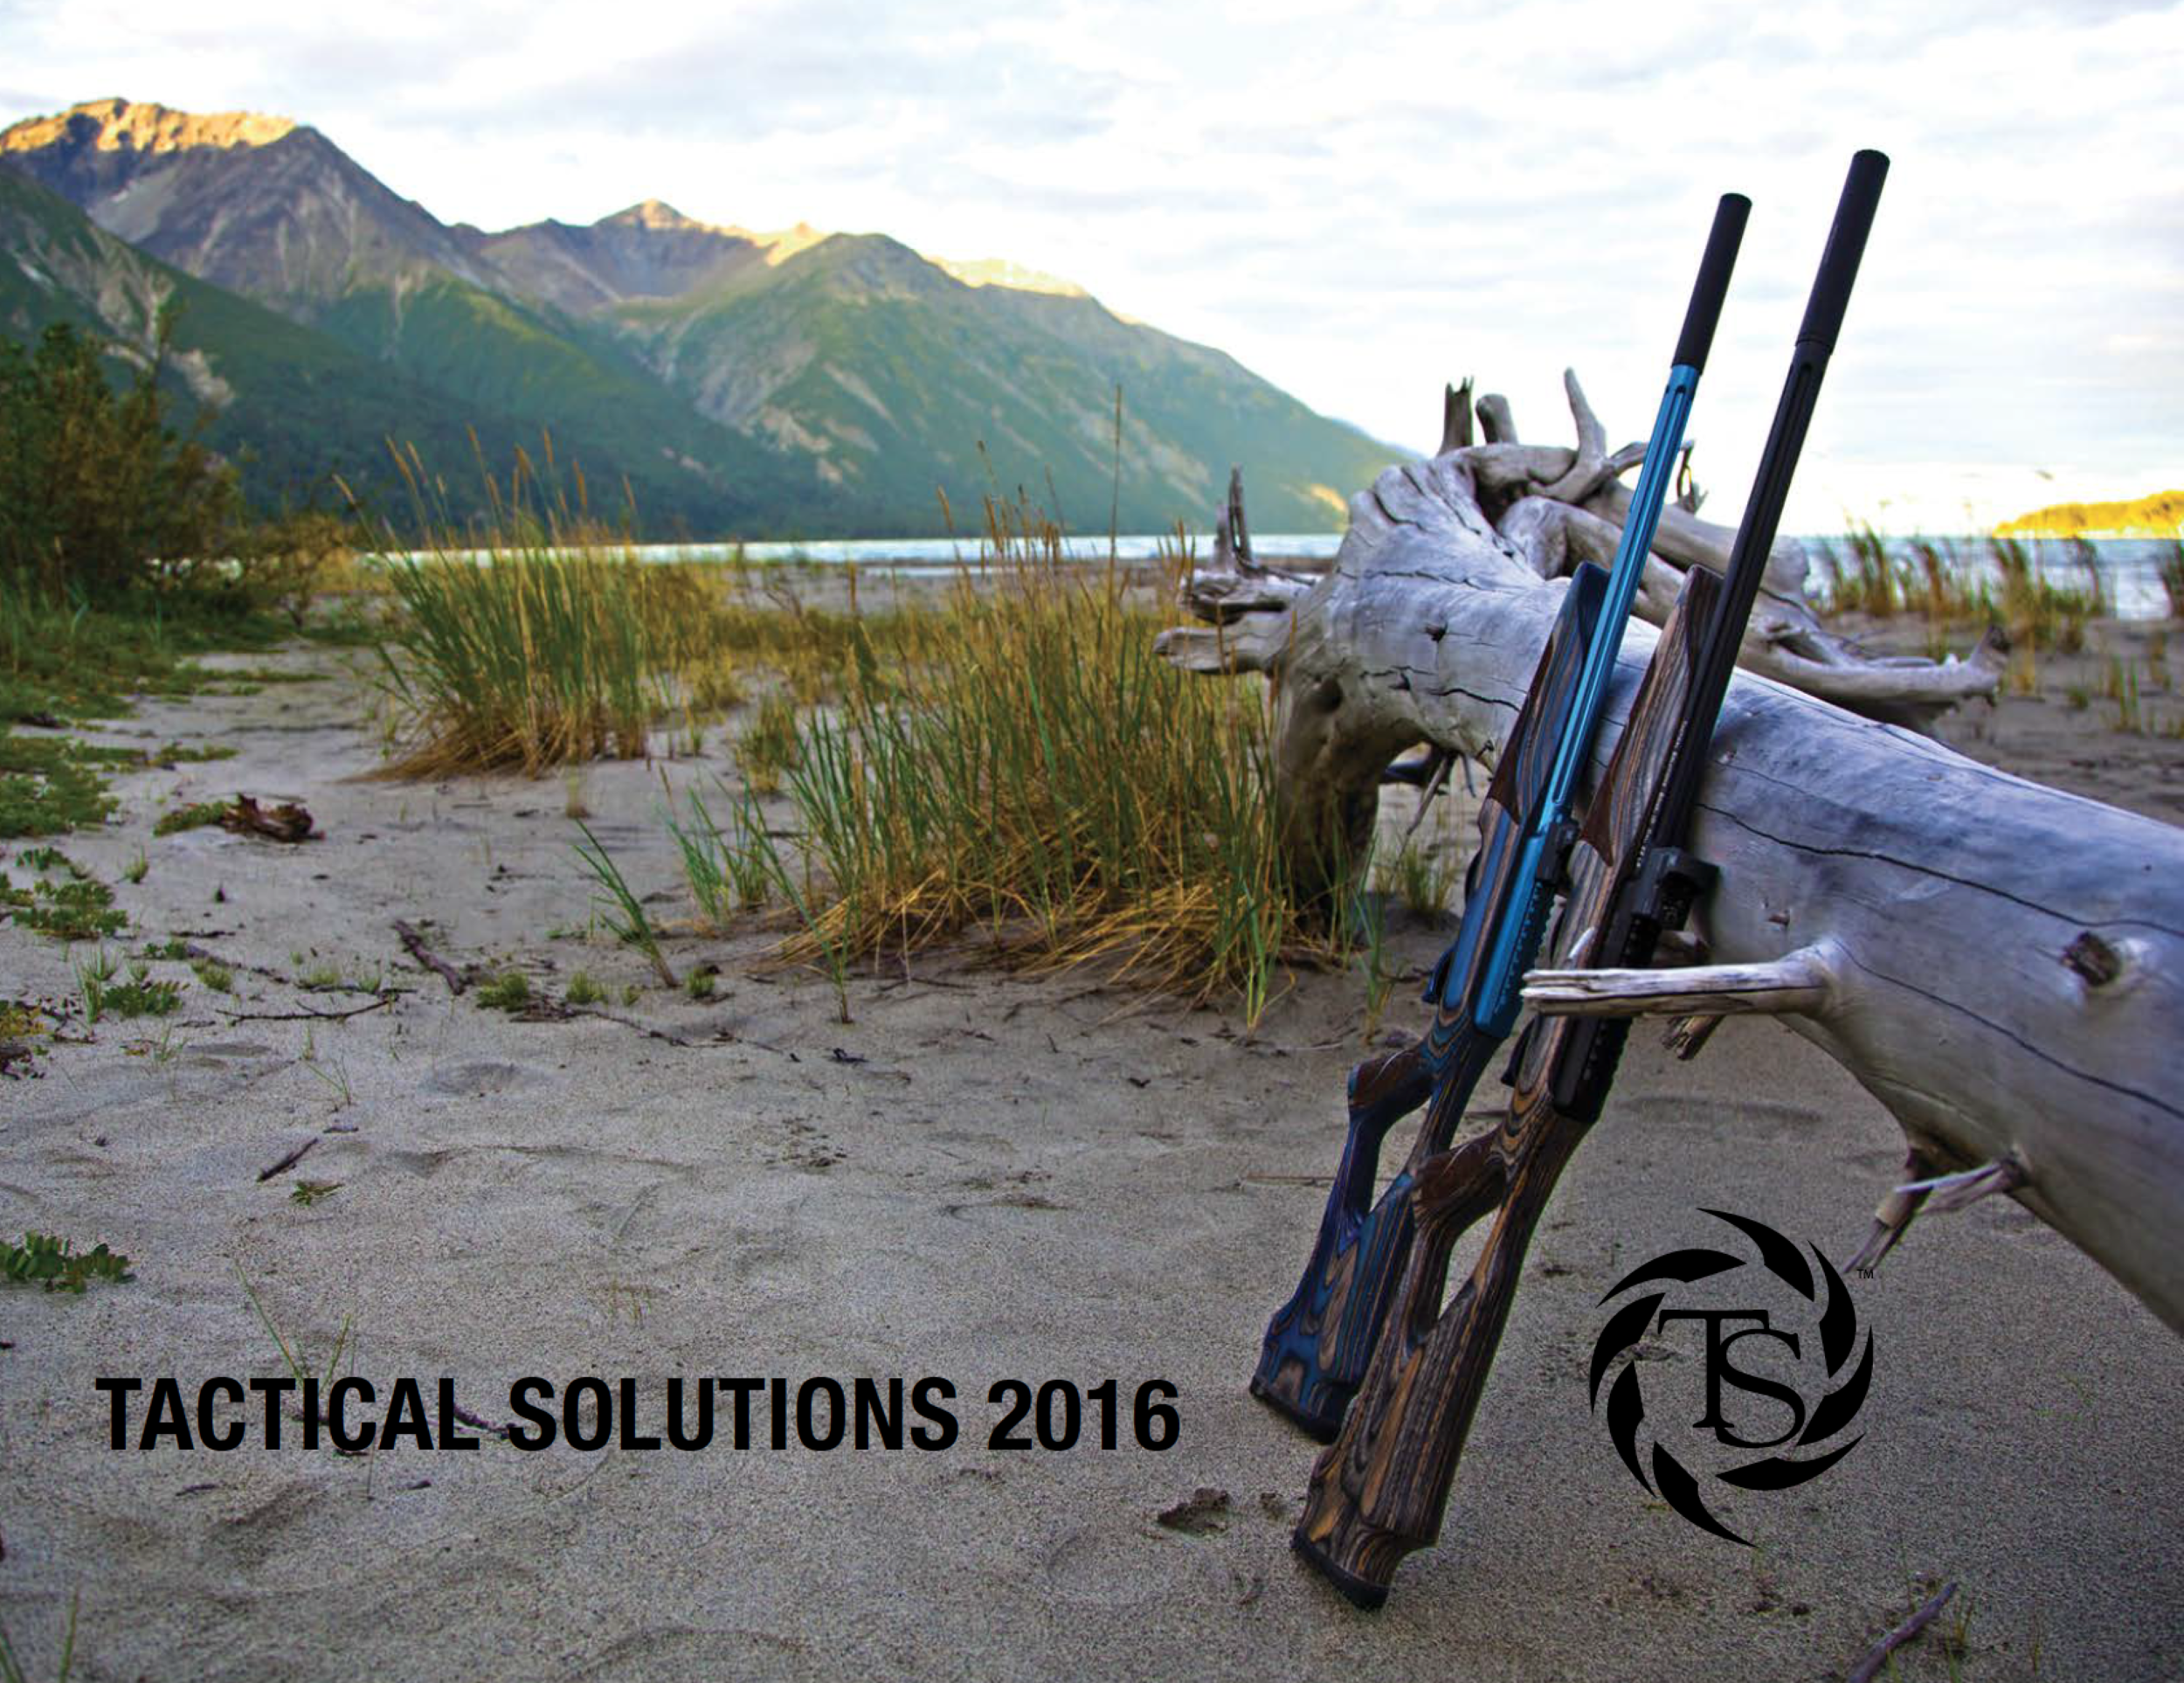 Tactical Solutions Catalog 2016